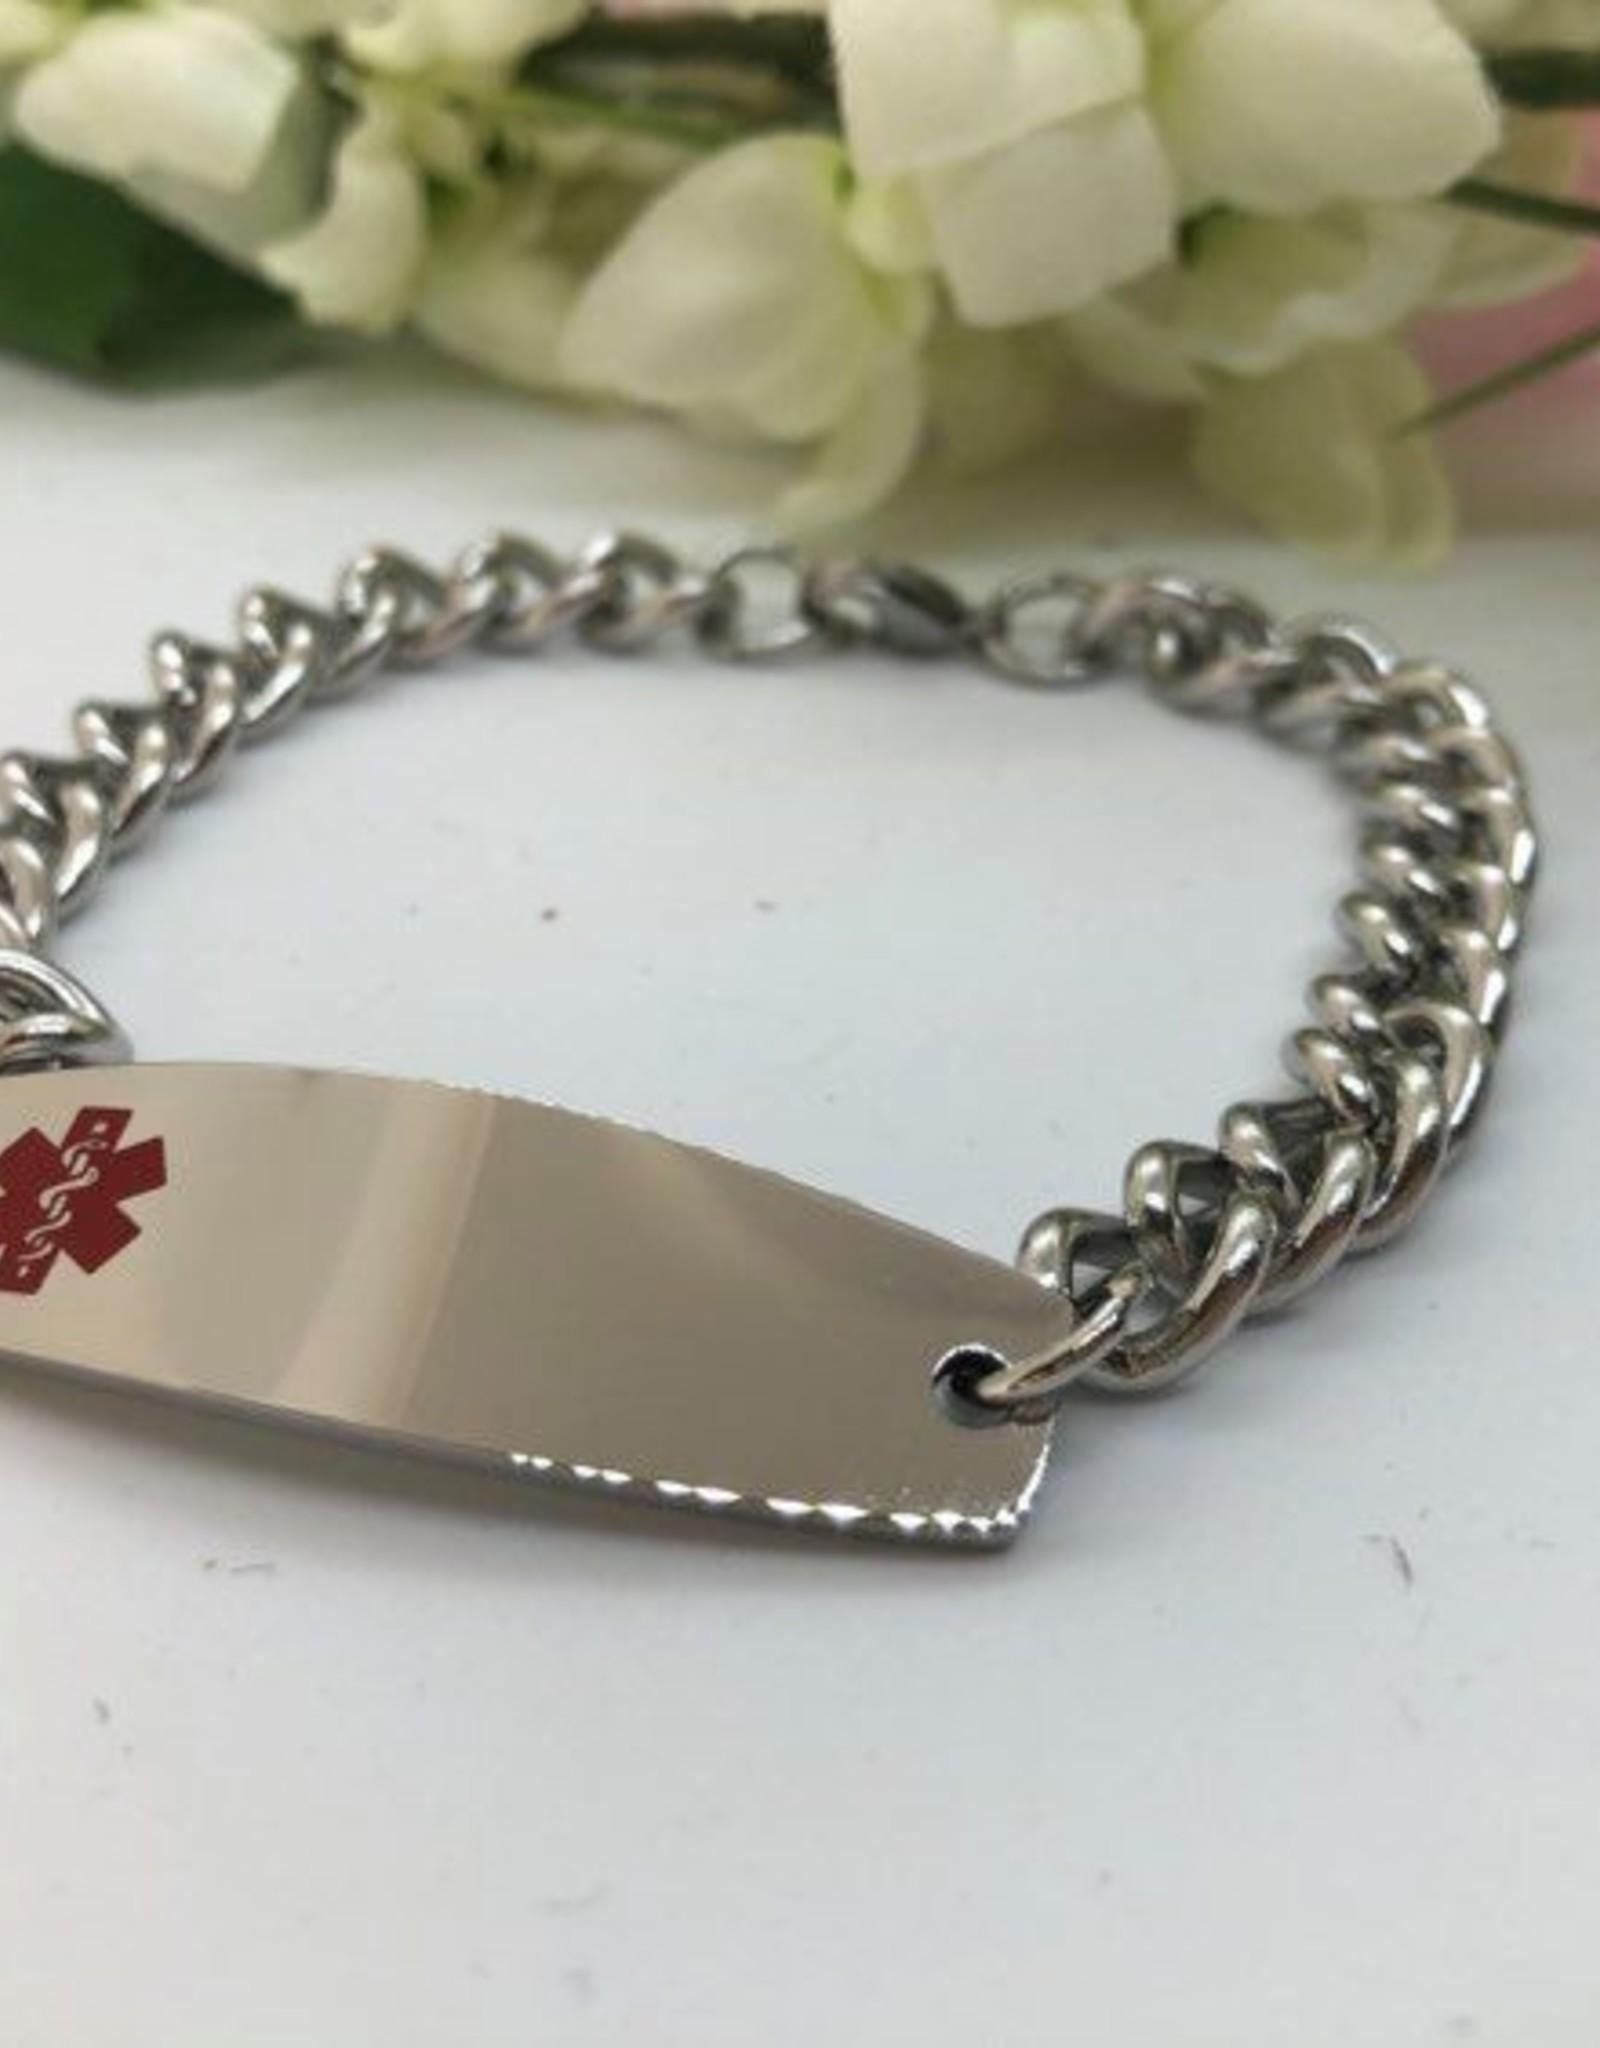 Mooie sierlijke klassieke armband